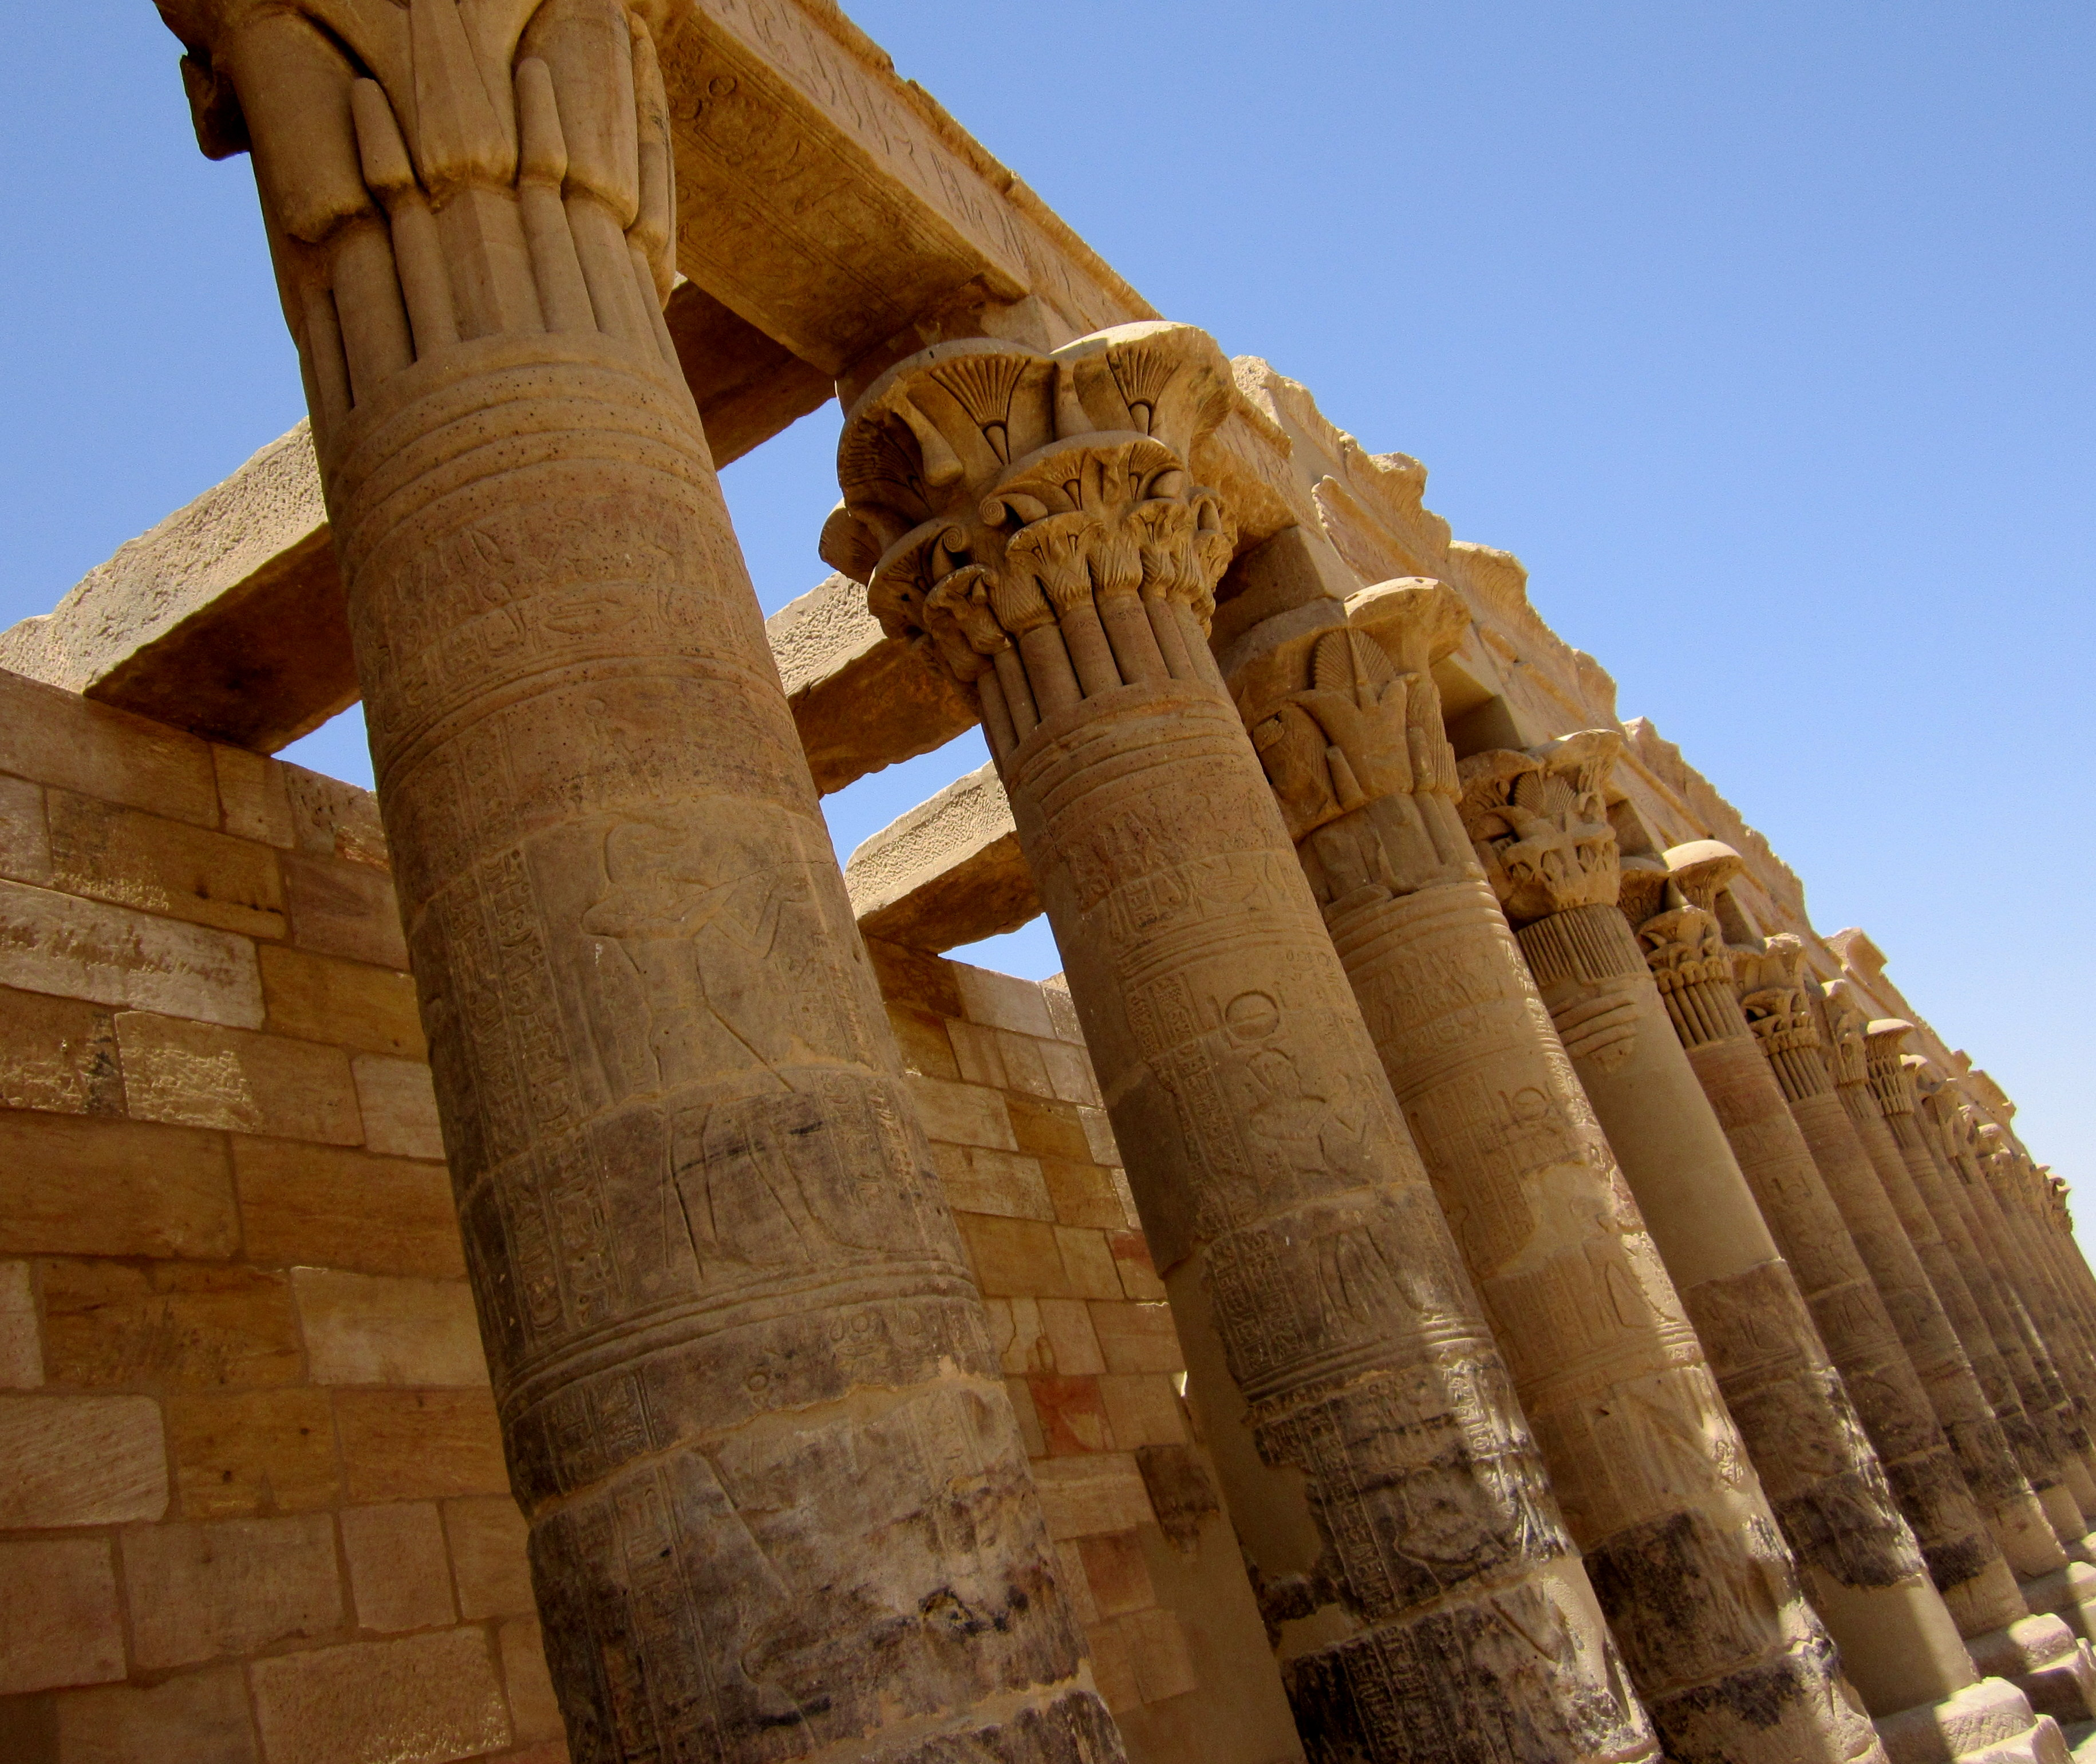 #egypt #egypttourism #aswan #aswannile #philaeaswan #nile